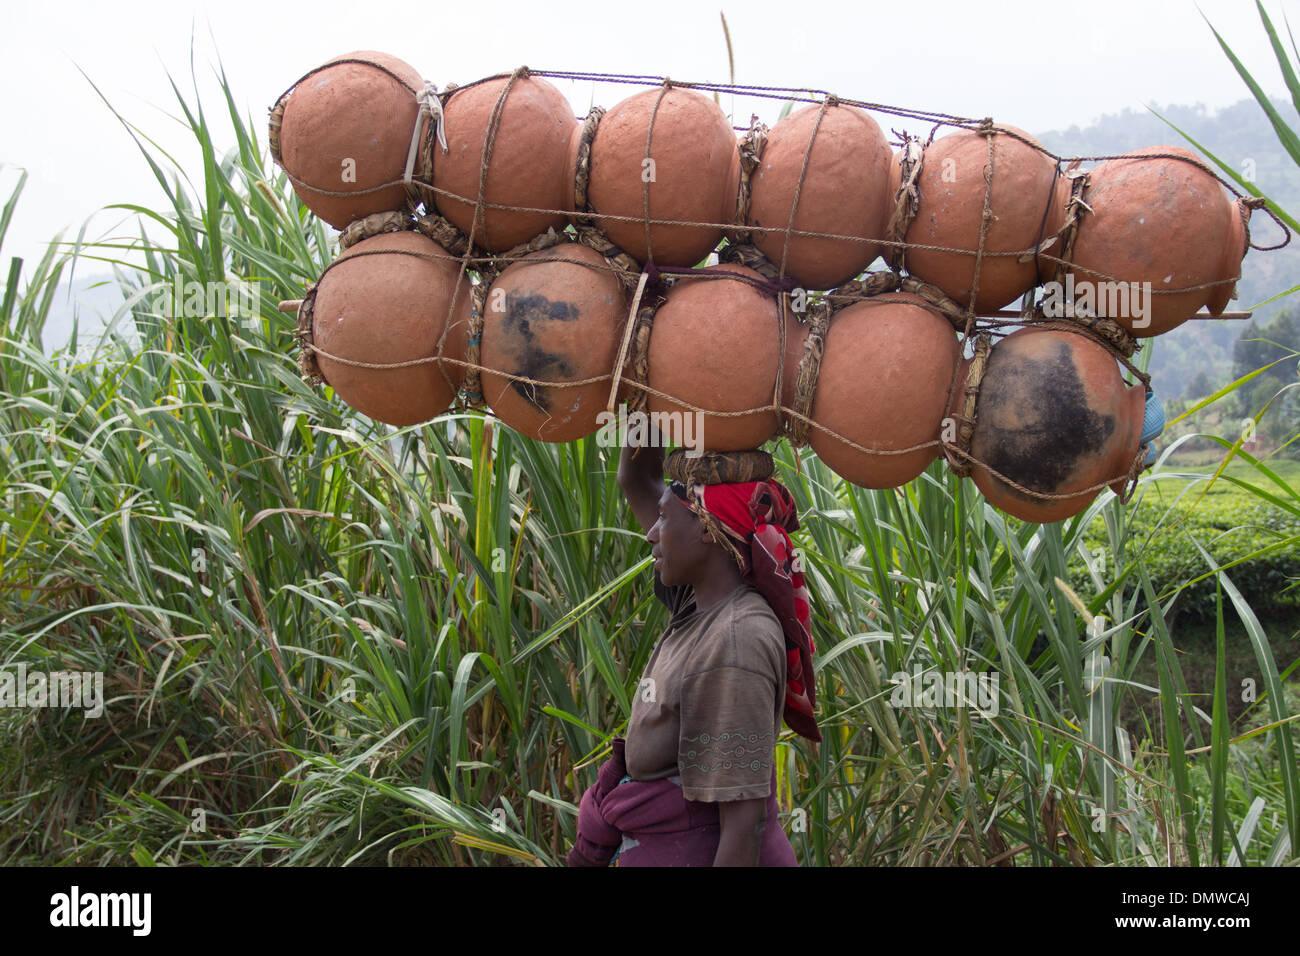 black woman carrying bottles burden bearer - Stock Image